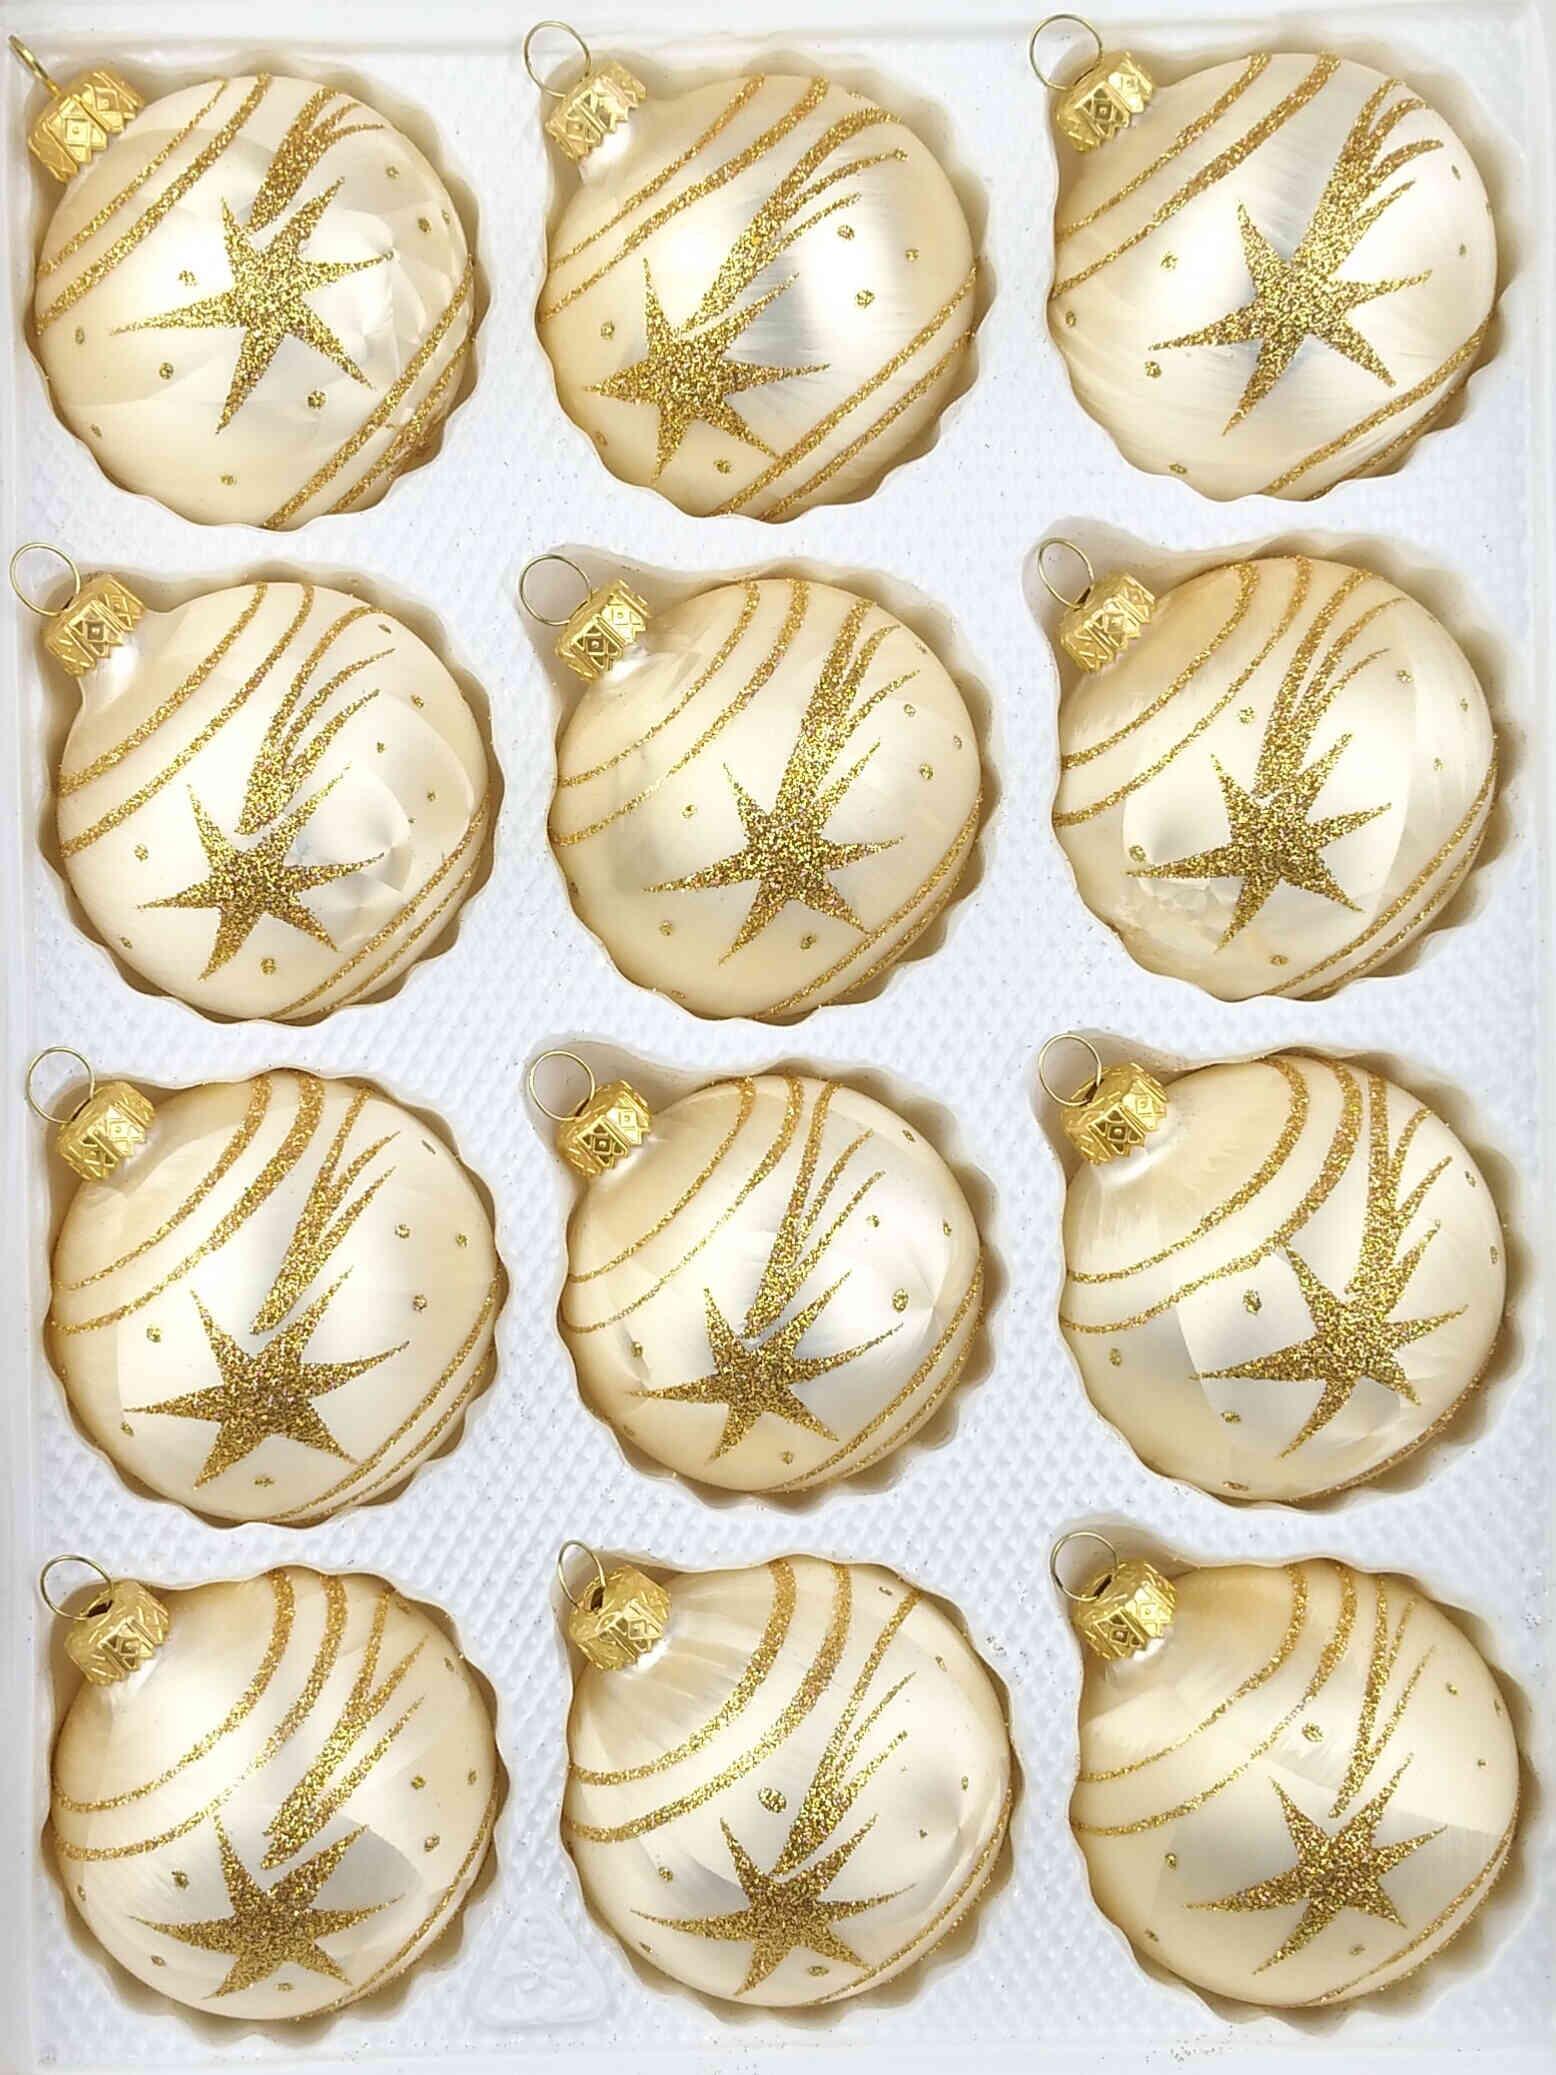 12 Handmade Christmas Ornaments Champagne Gold Comet Balls